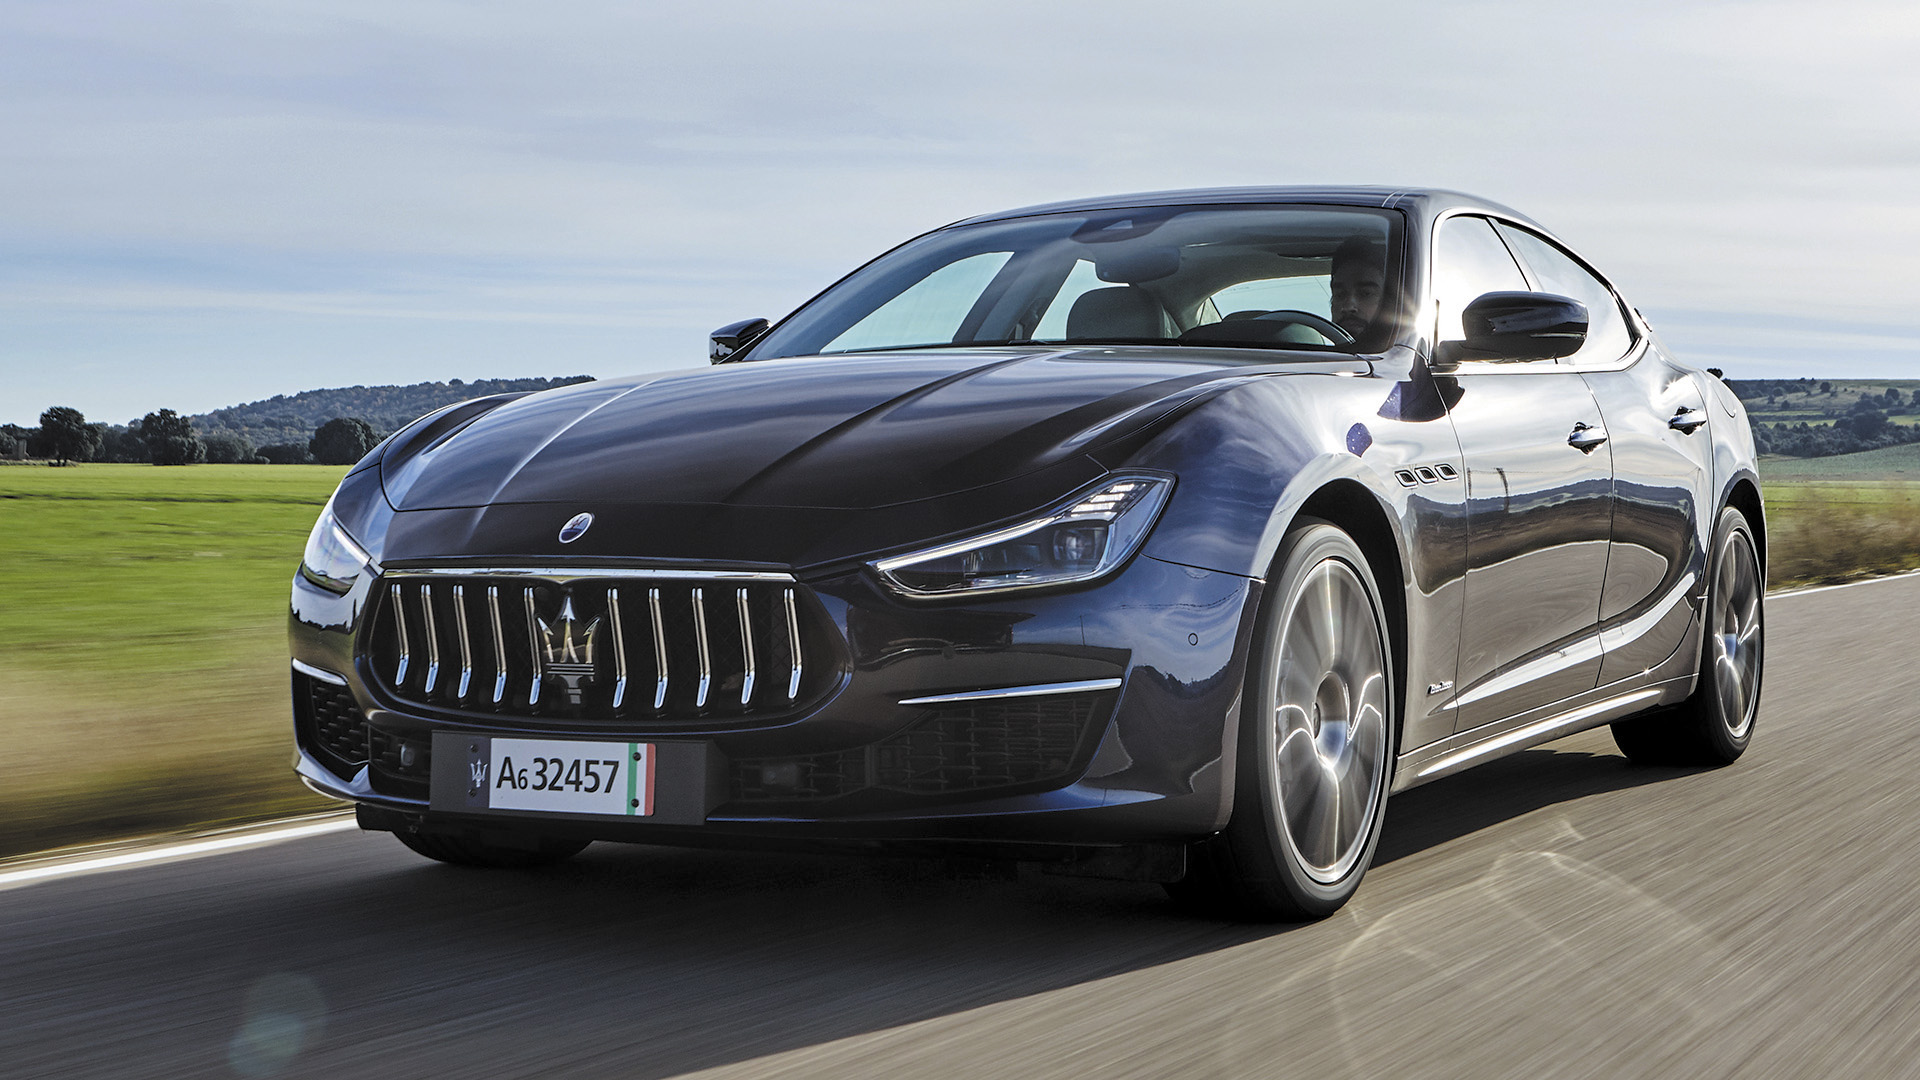 Nuevo Maserati Ghibli Hybrid 2021: primera prueba